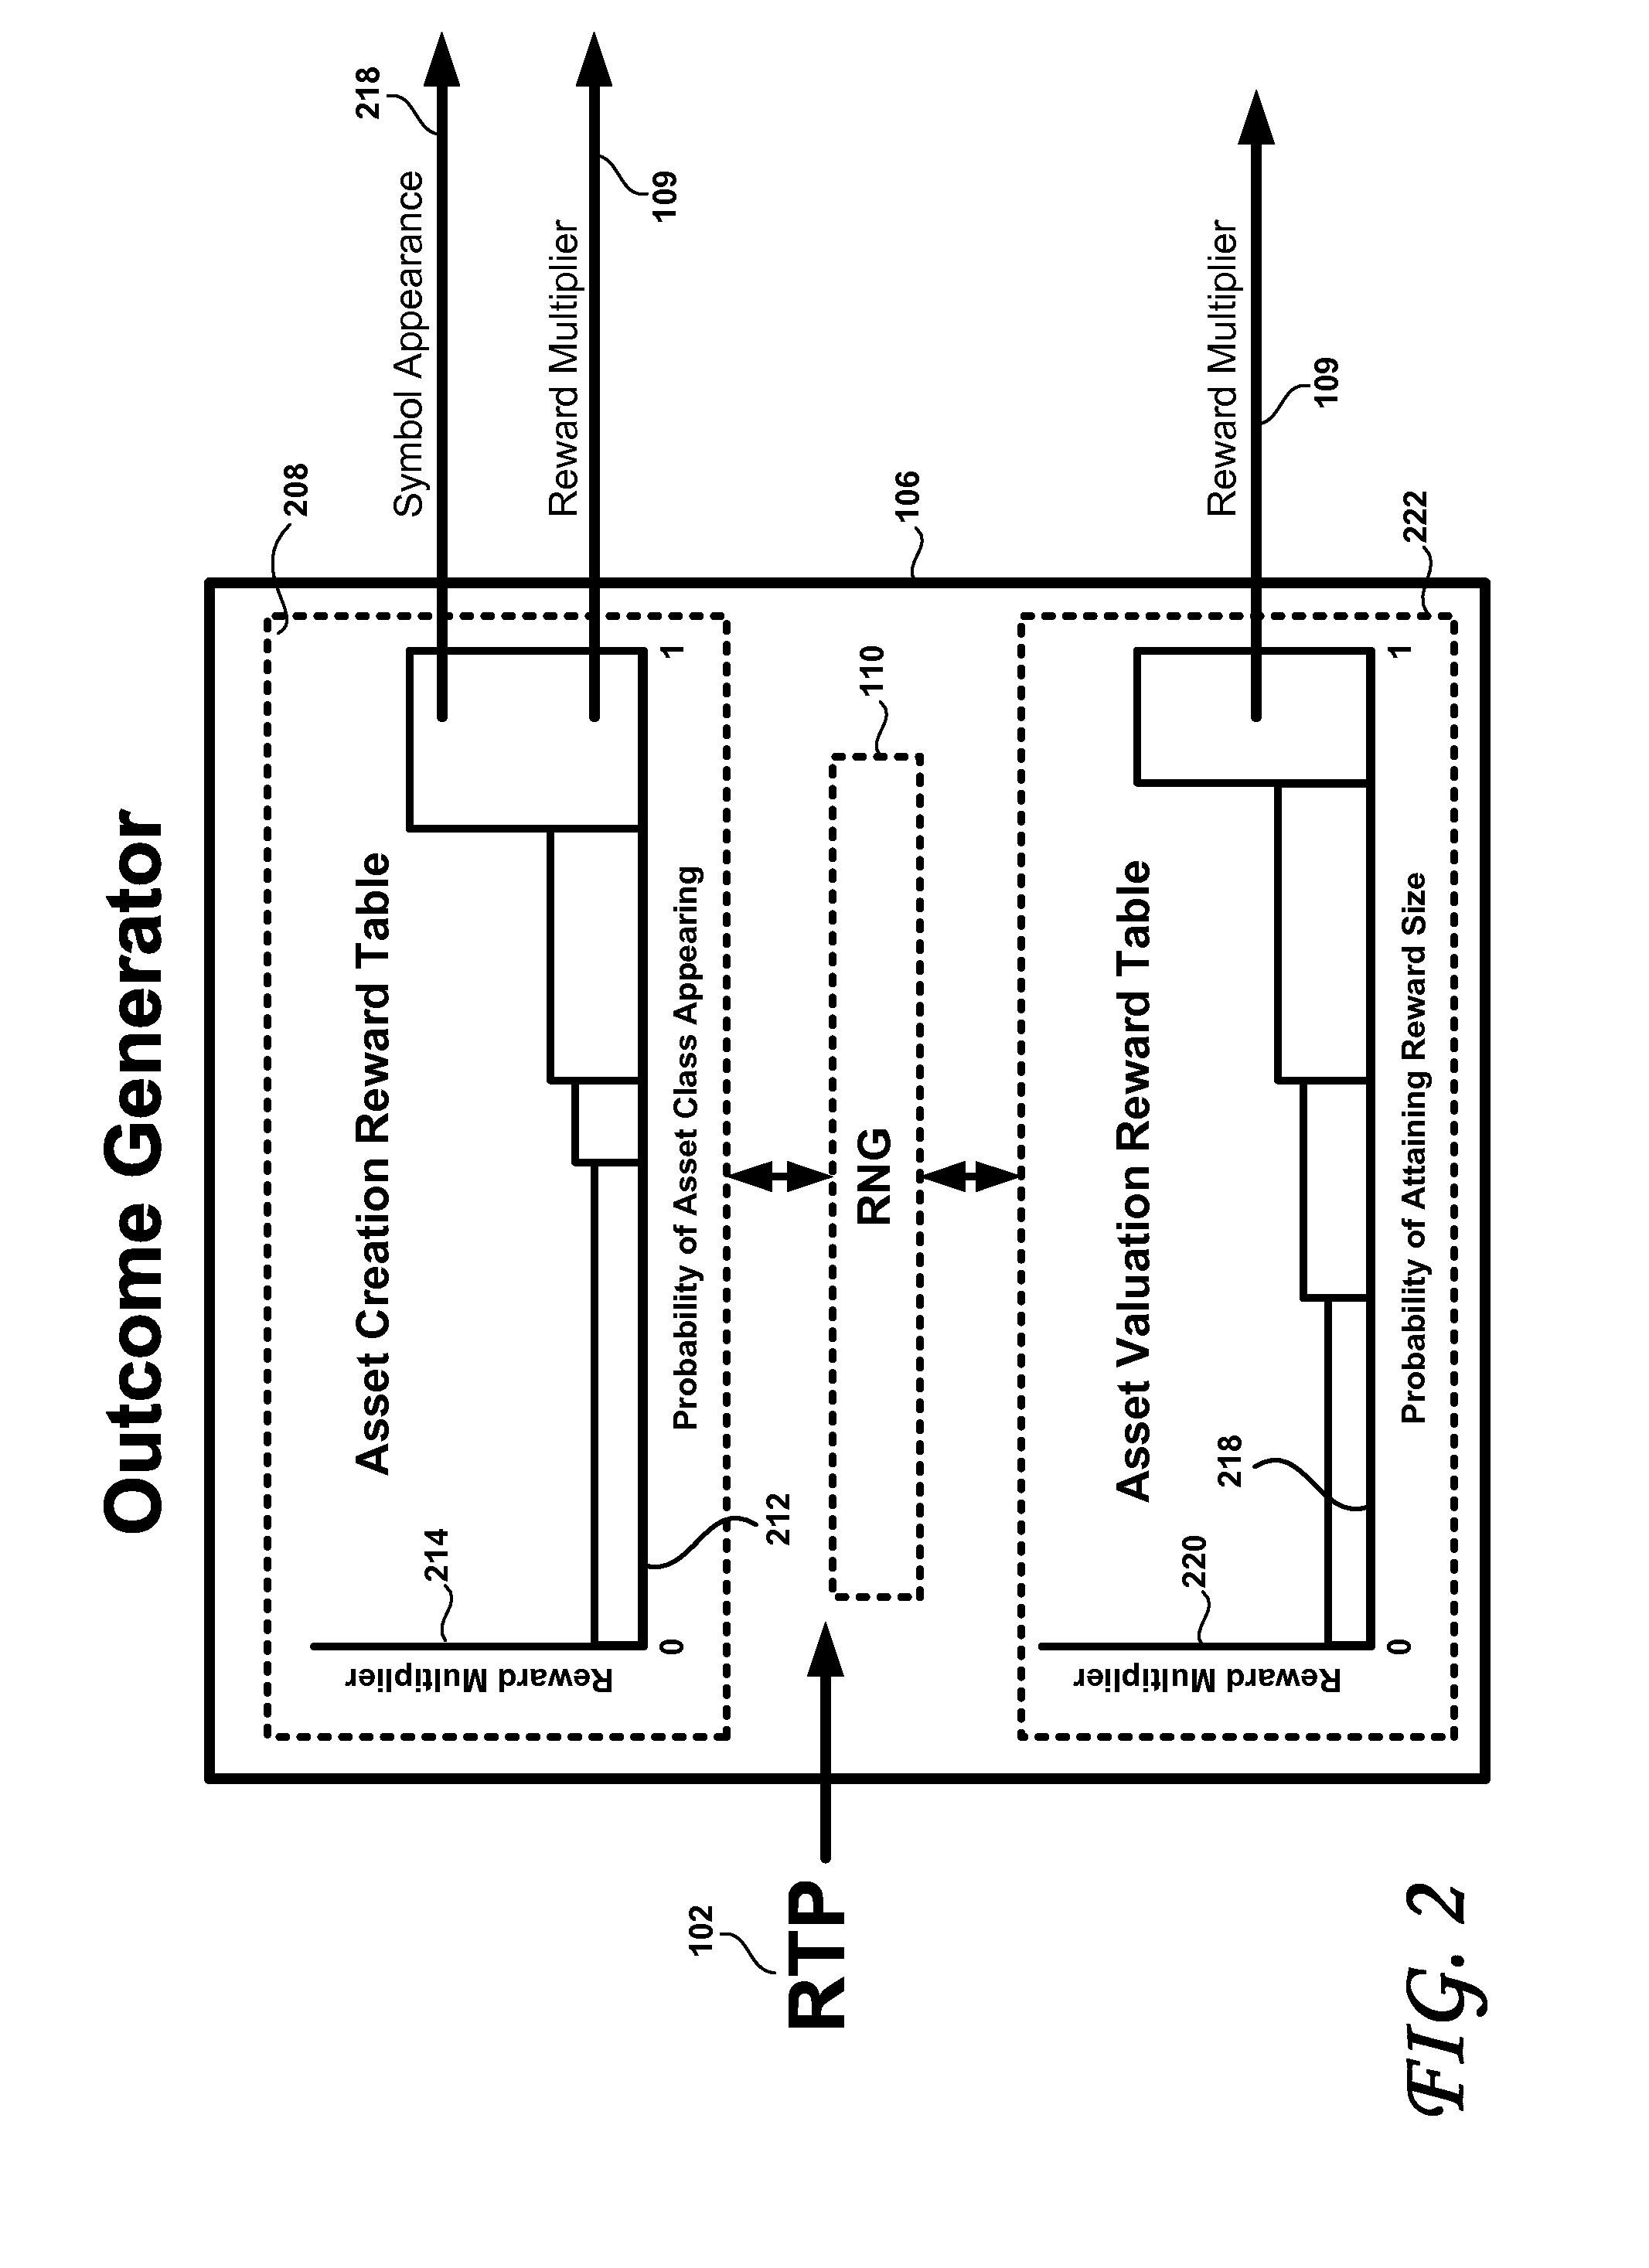 patent a casino game